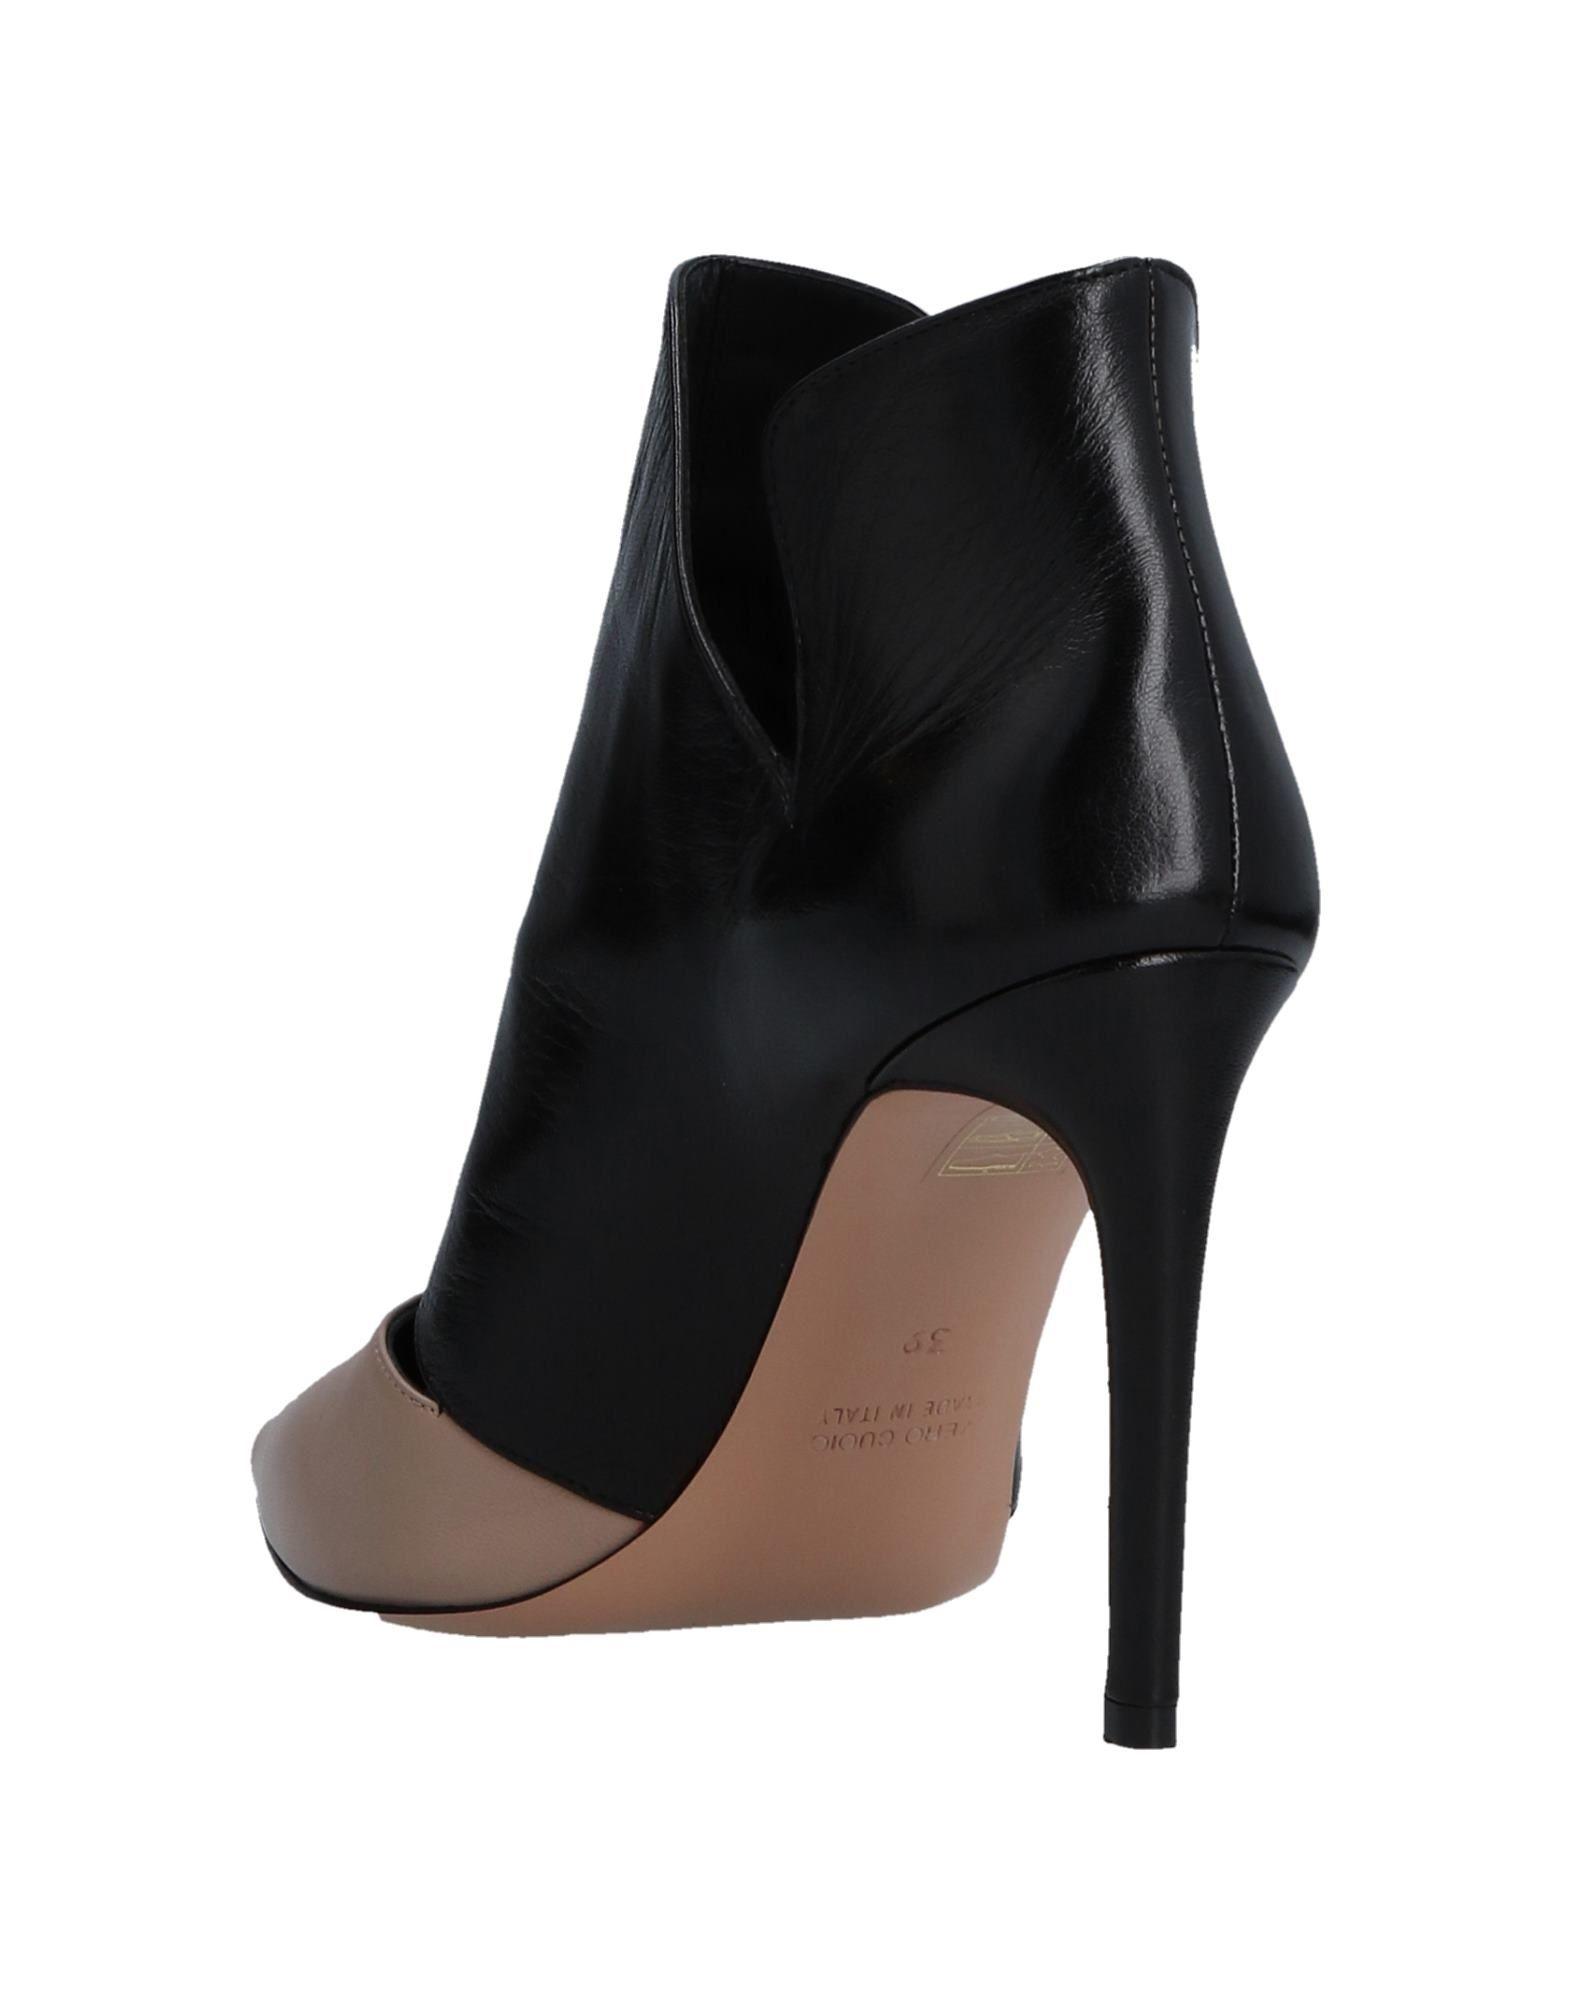 Rabatt Schuhe Jean 11521532MV 11521532MV 11521532MV Günstige und langlebige Schuhe bcb52f